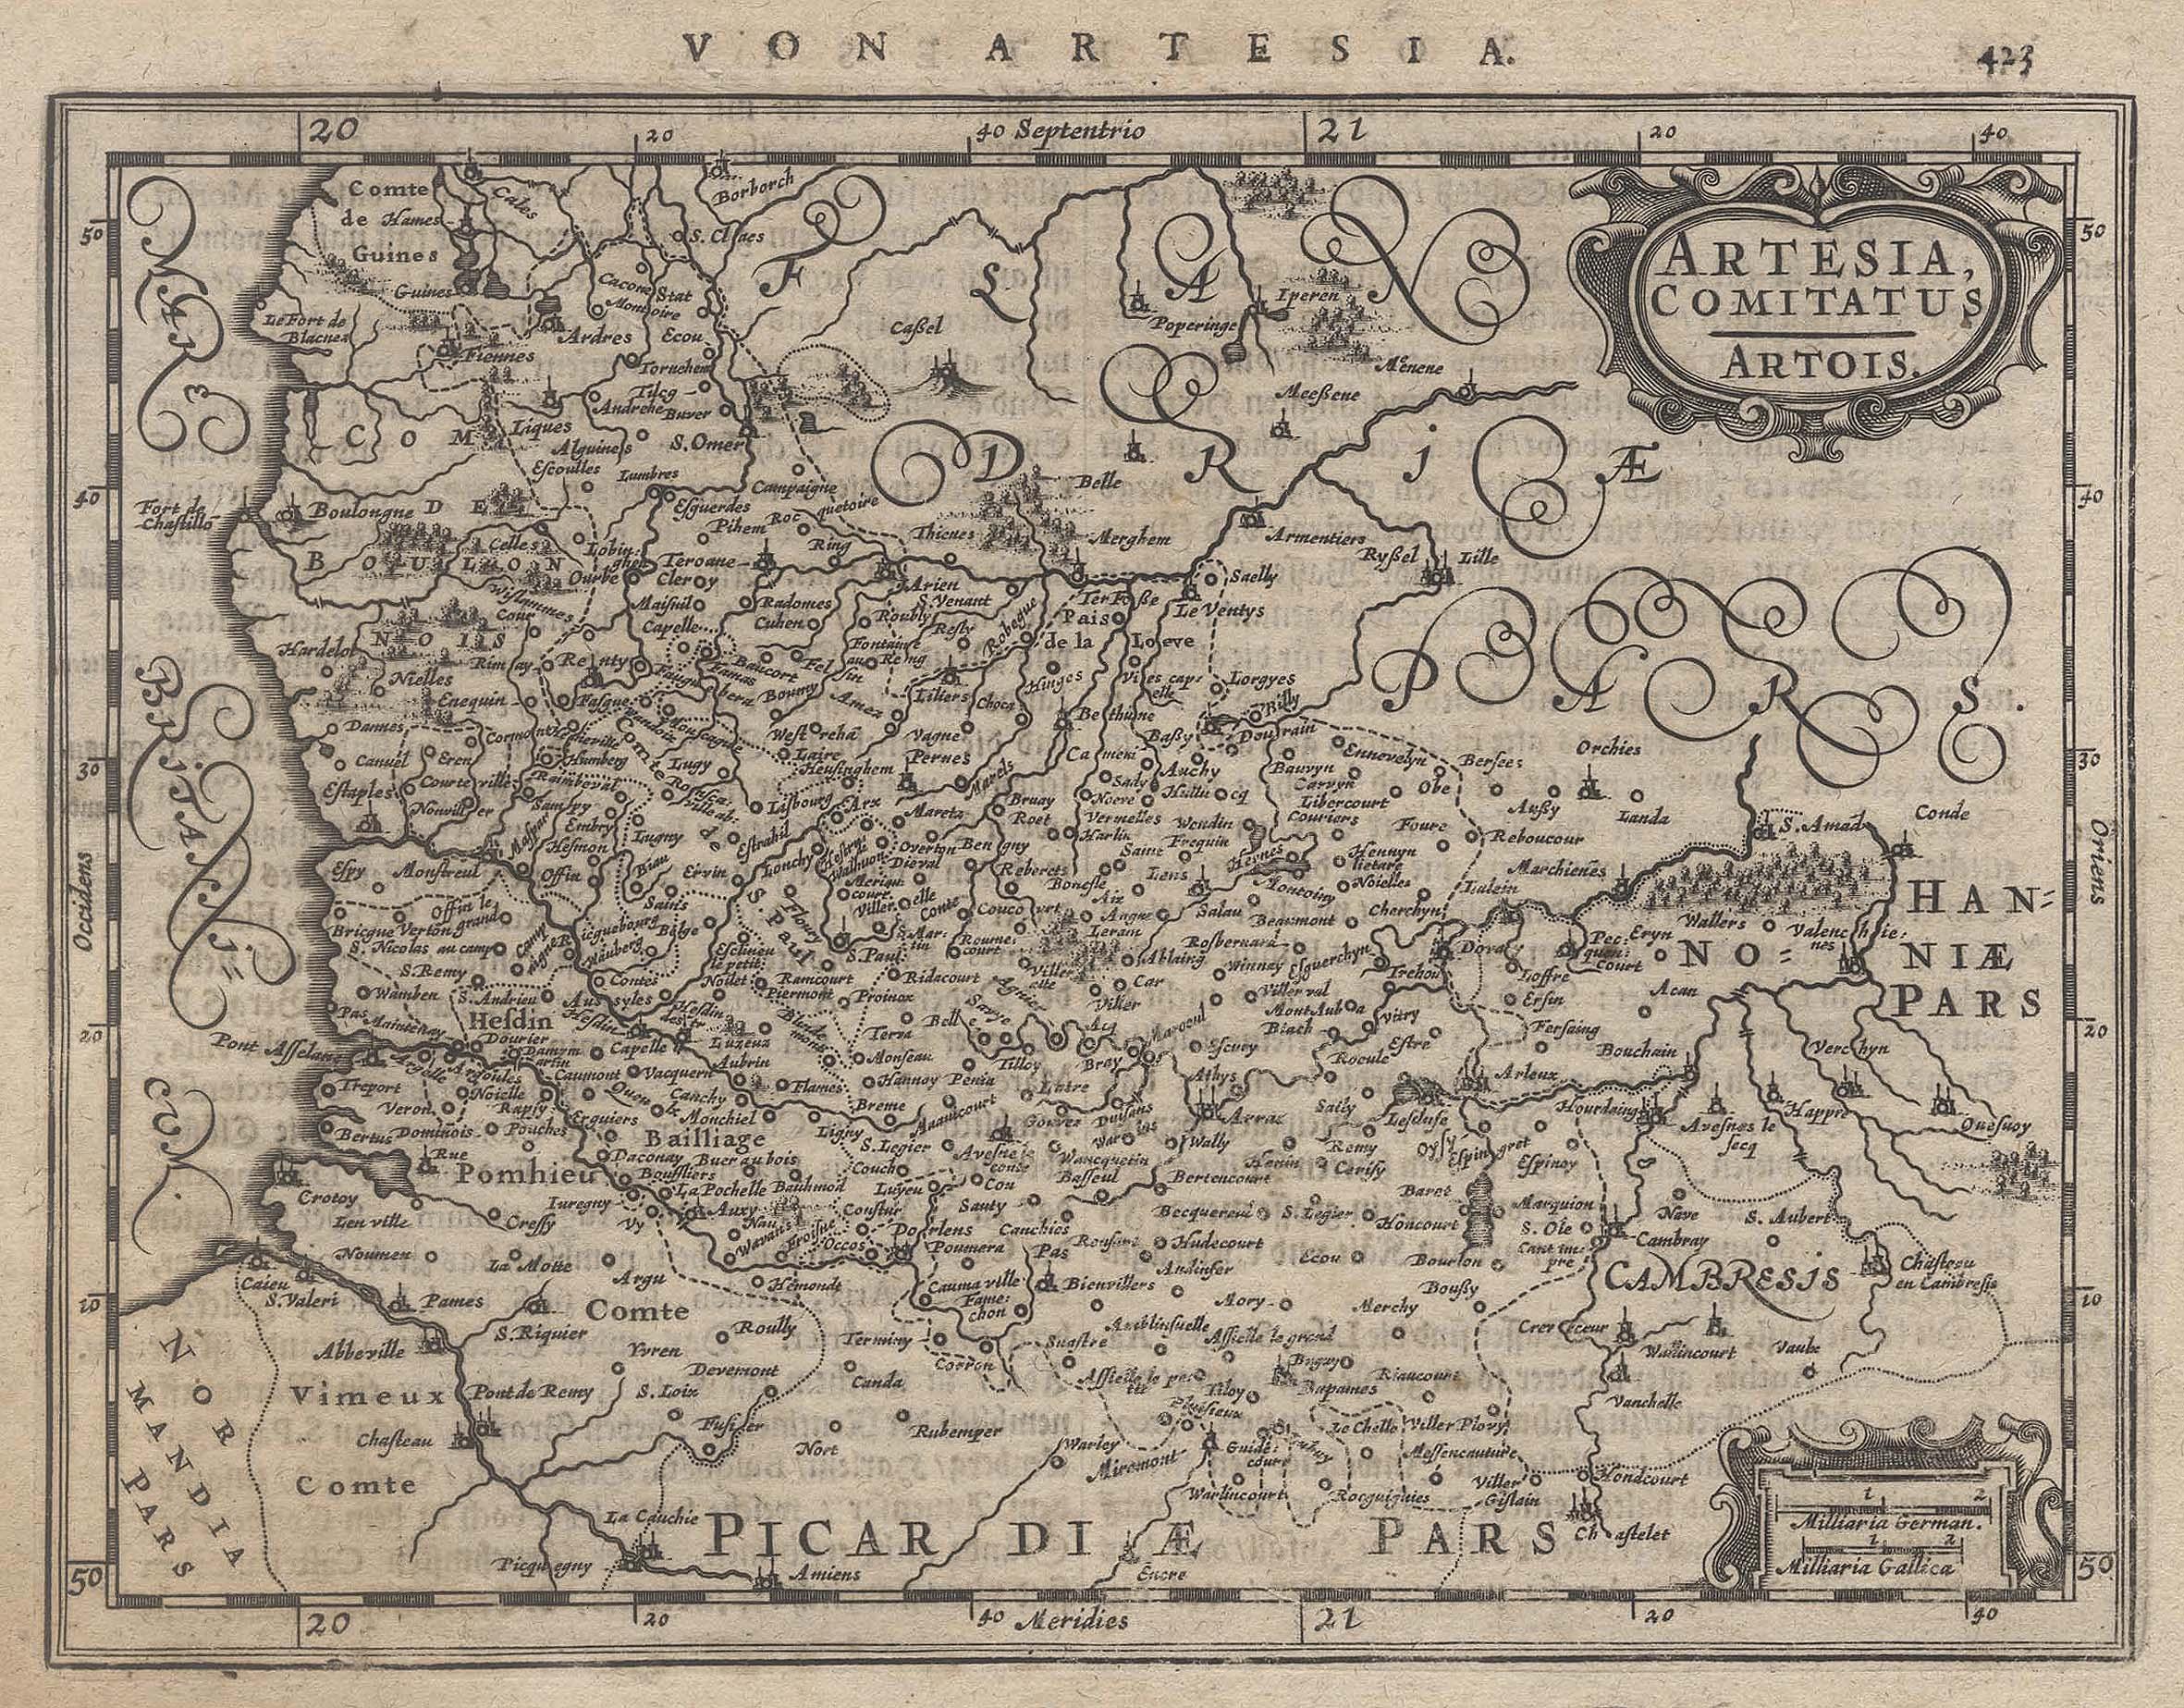 Kst.- Karte, b. Janssonius aus Atlas Minor,: Artois: